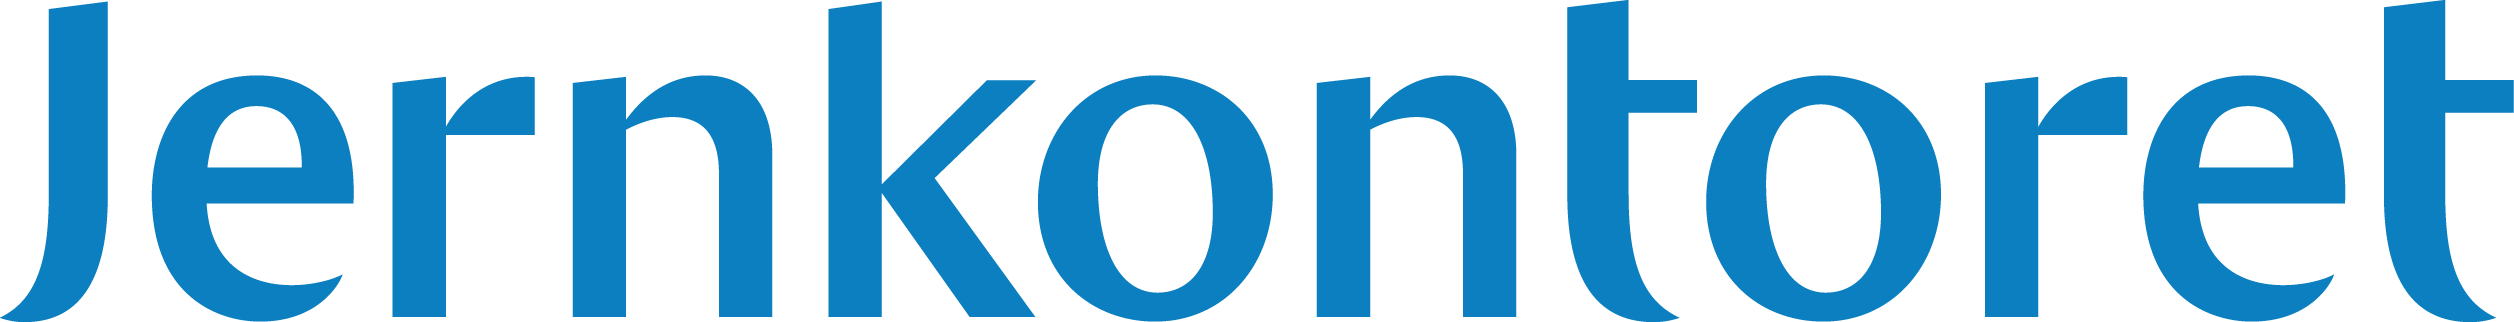 Jernkontoret logotyp